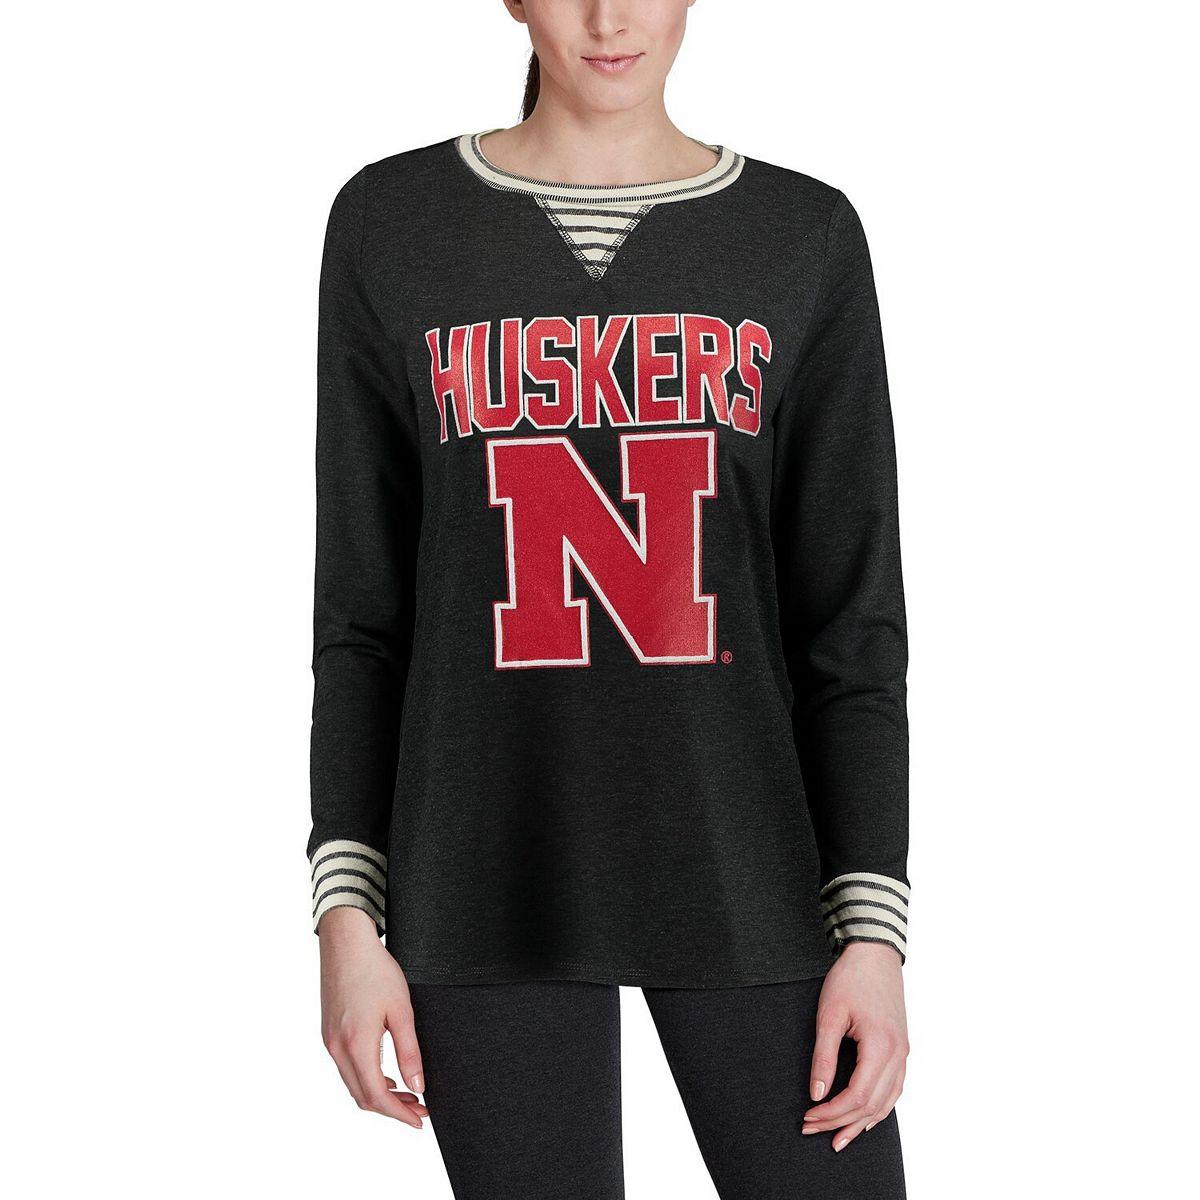 Women's Heathered Charcoal Nebraska Cornhuskers Striped Panel Oversized Long Sleeve Tri-Blend Tunic Shirt LwMYK